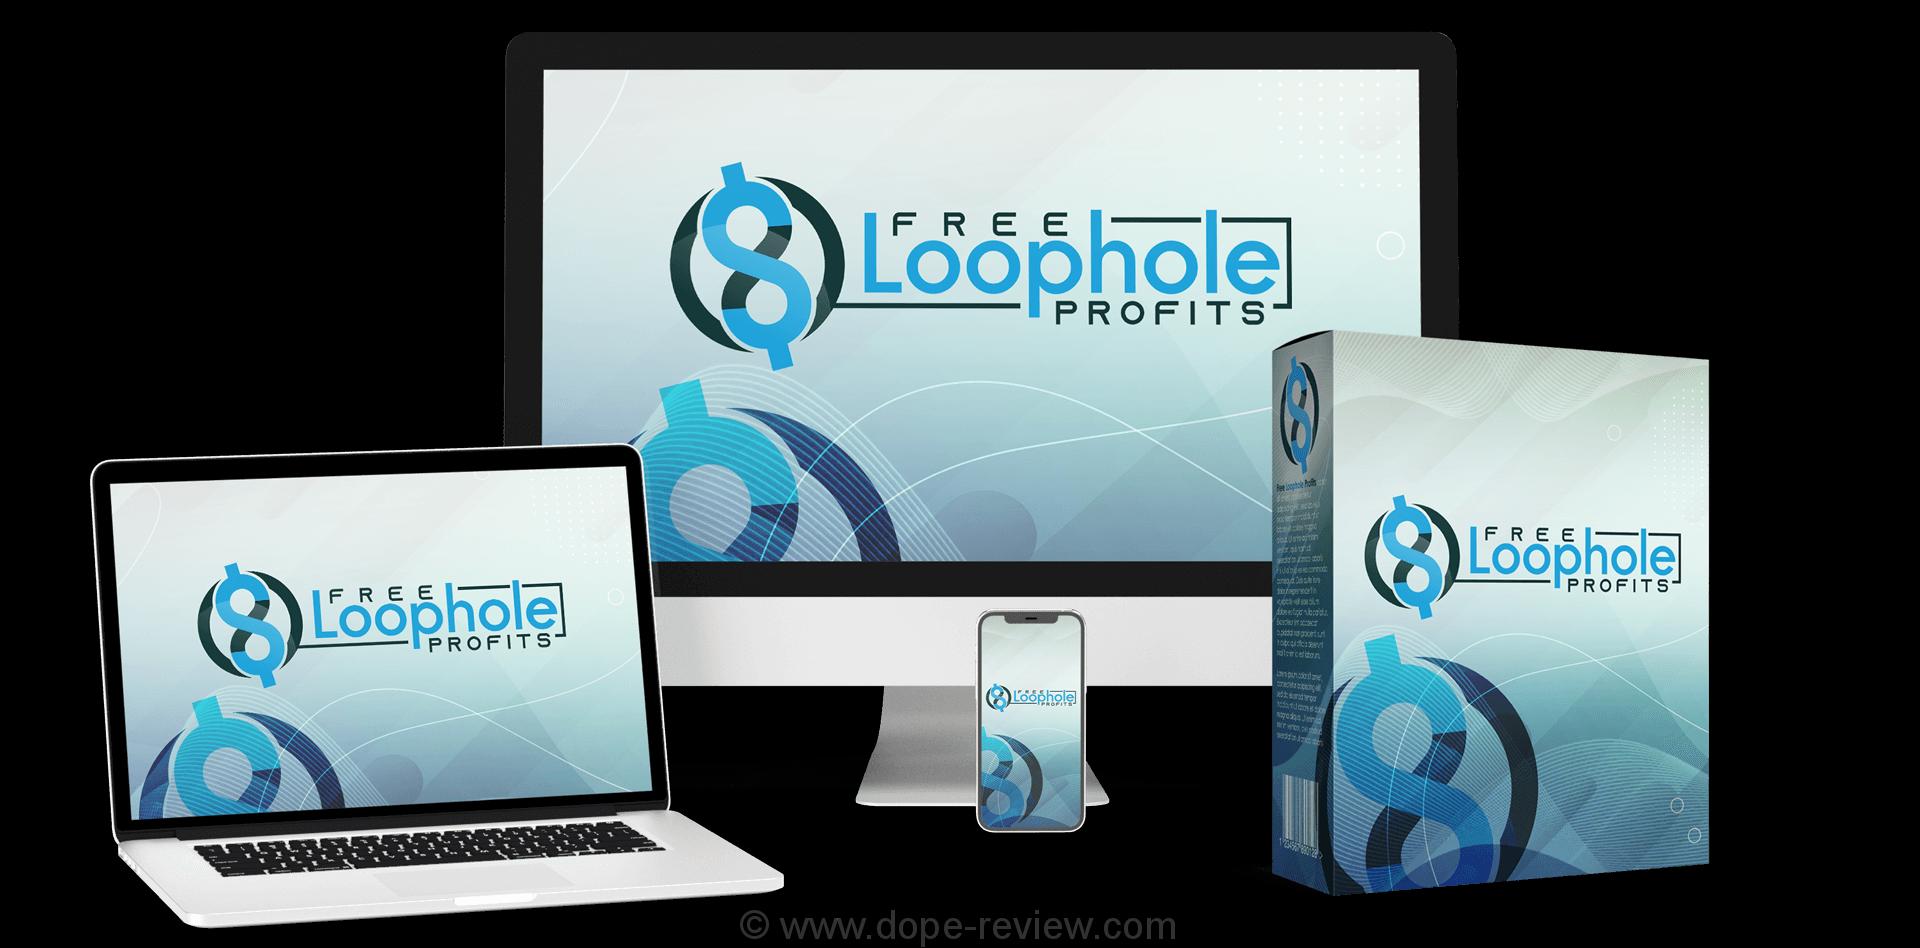 Free Loophole Profits Review